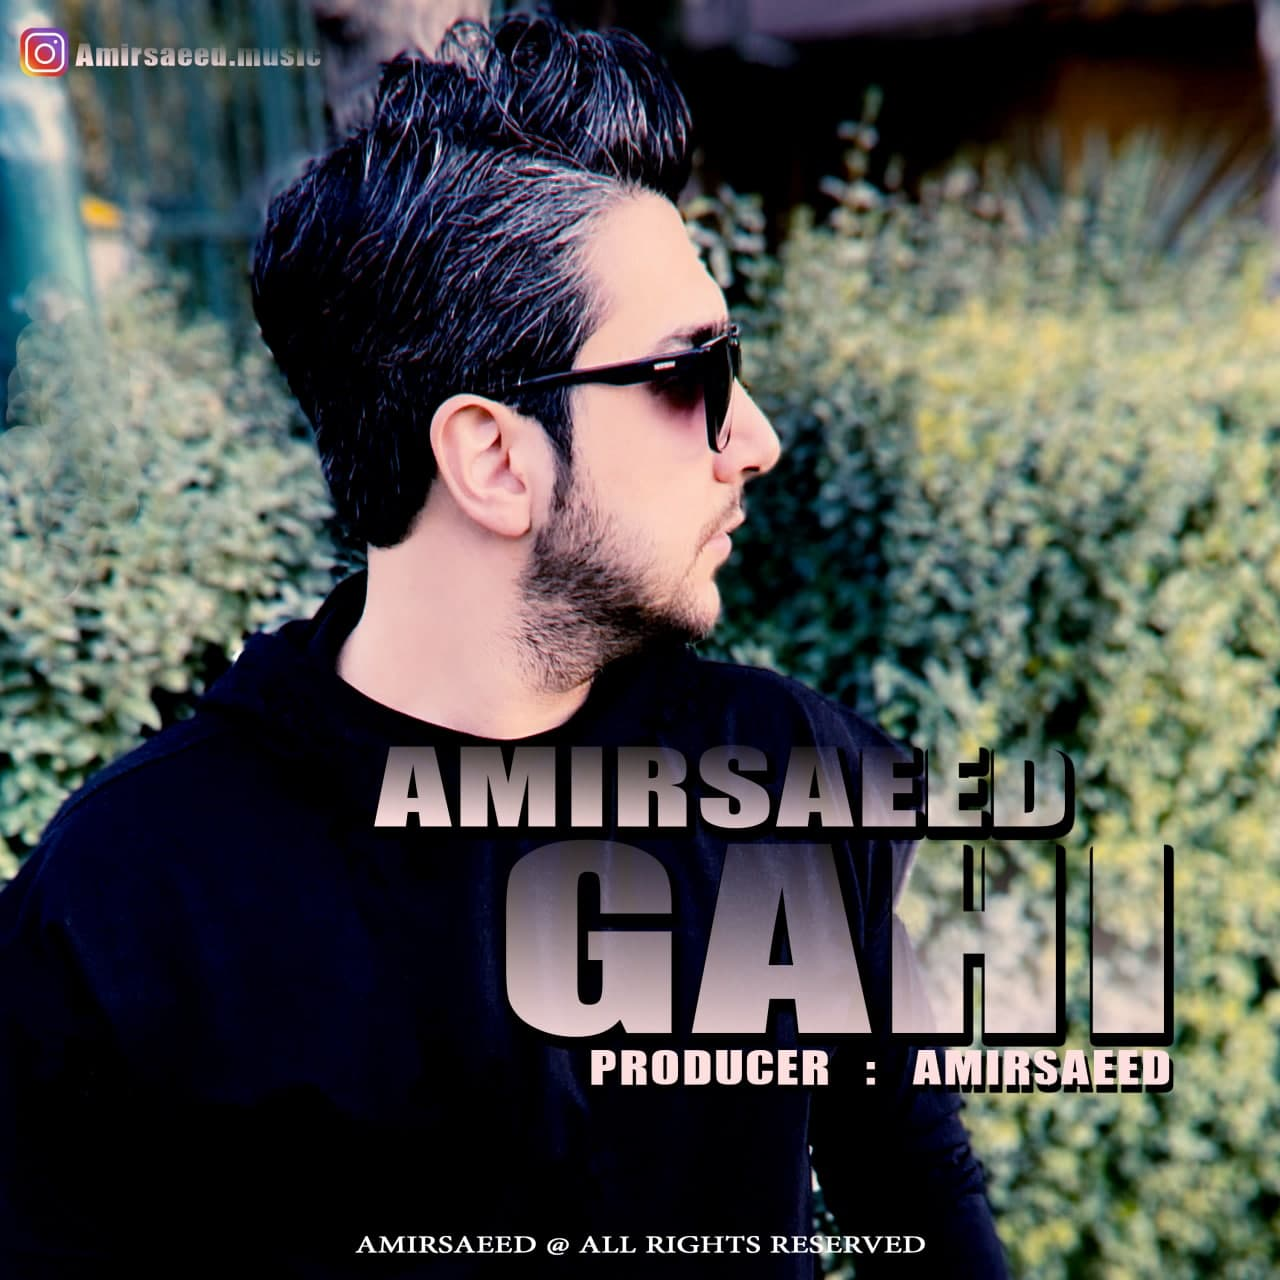 https://www.ganja2music.com/Image/Post/11.2020/AmirSaeed%20-%20Gahi.jpg